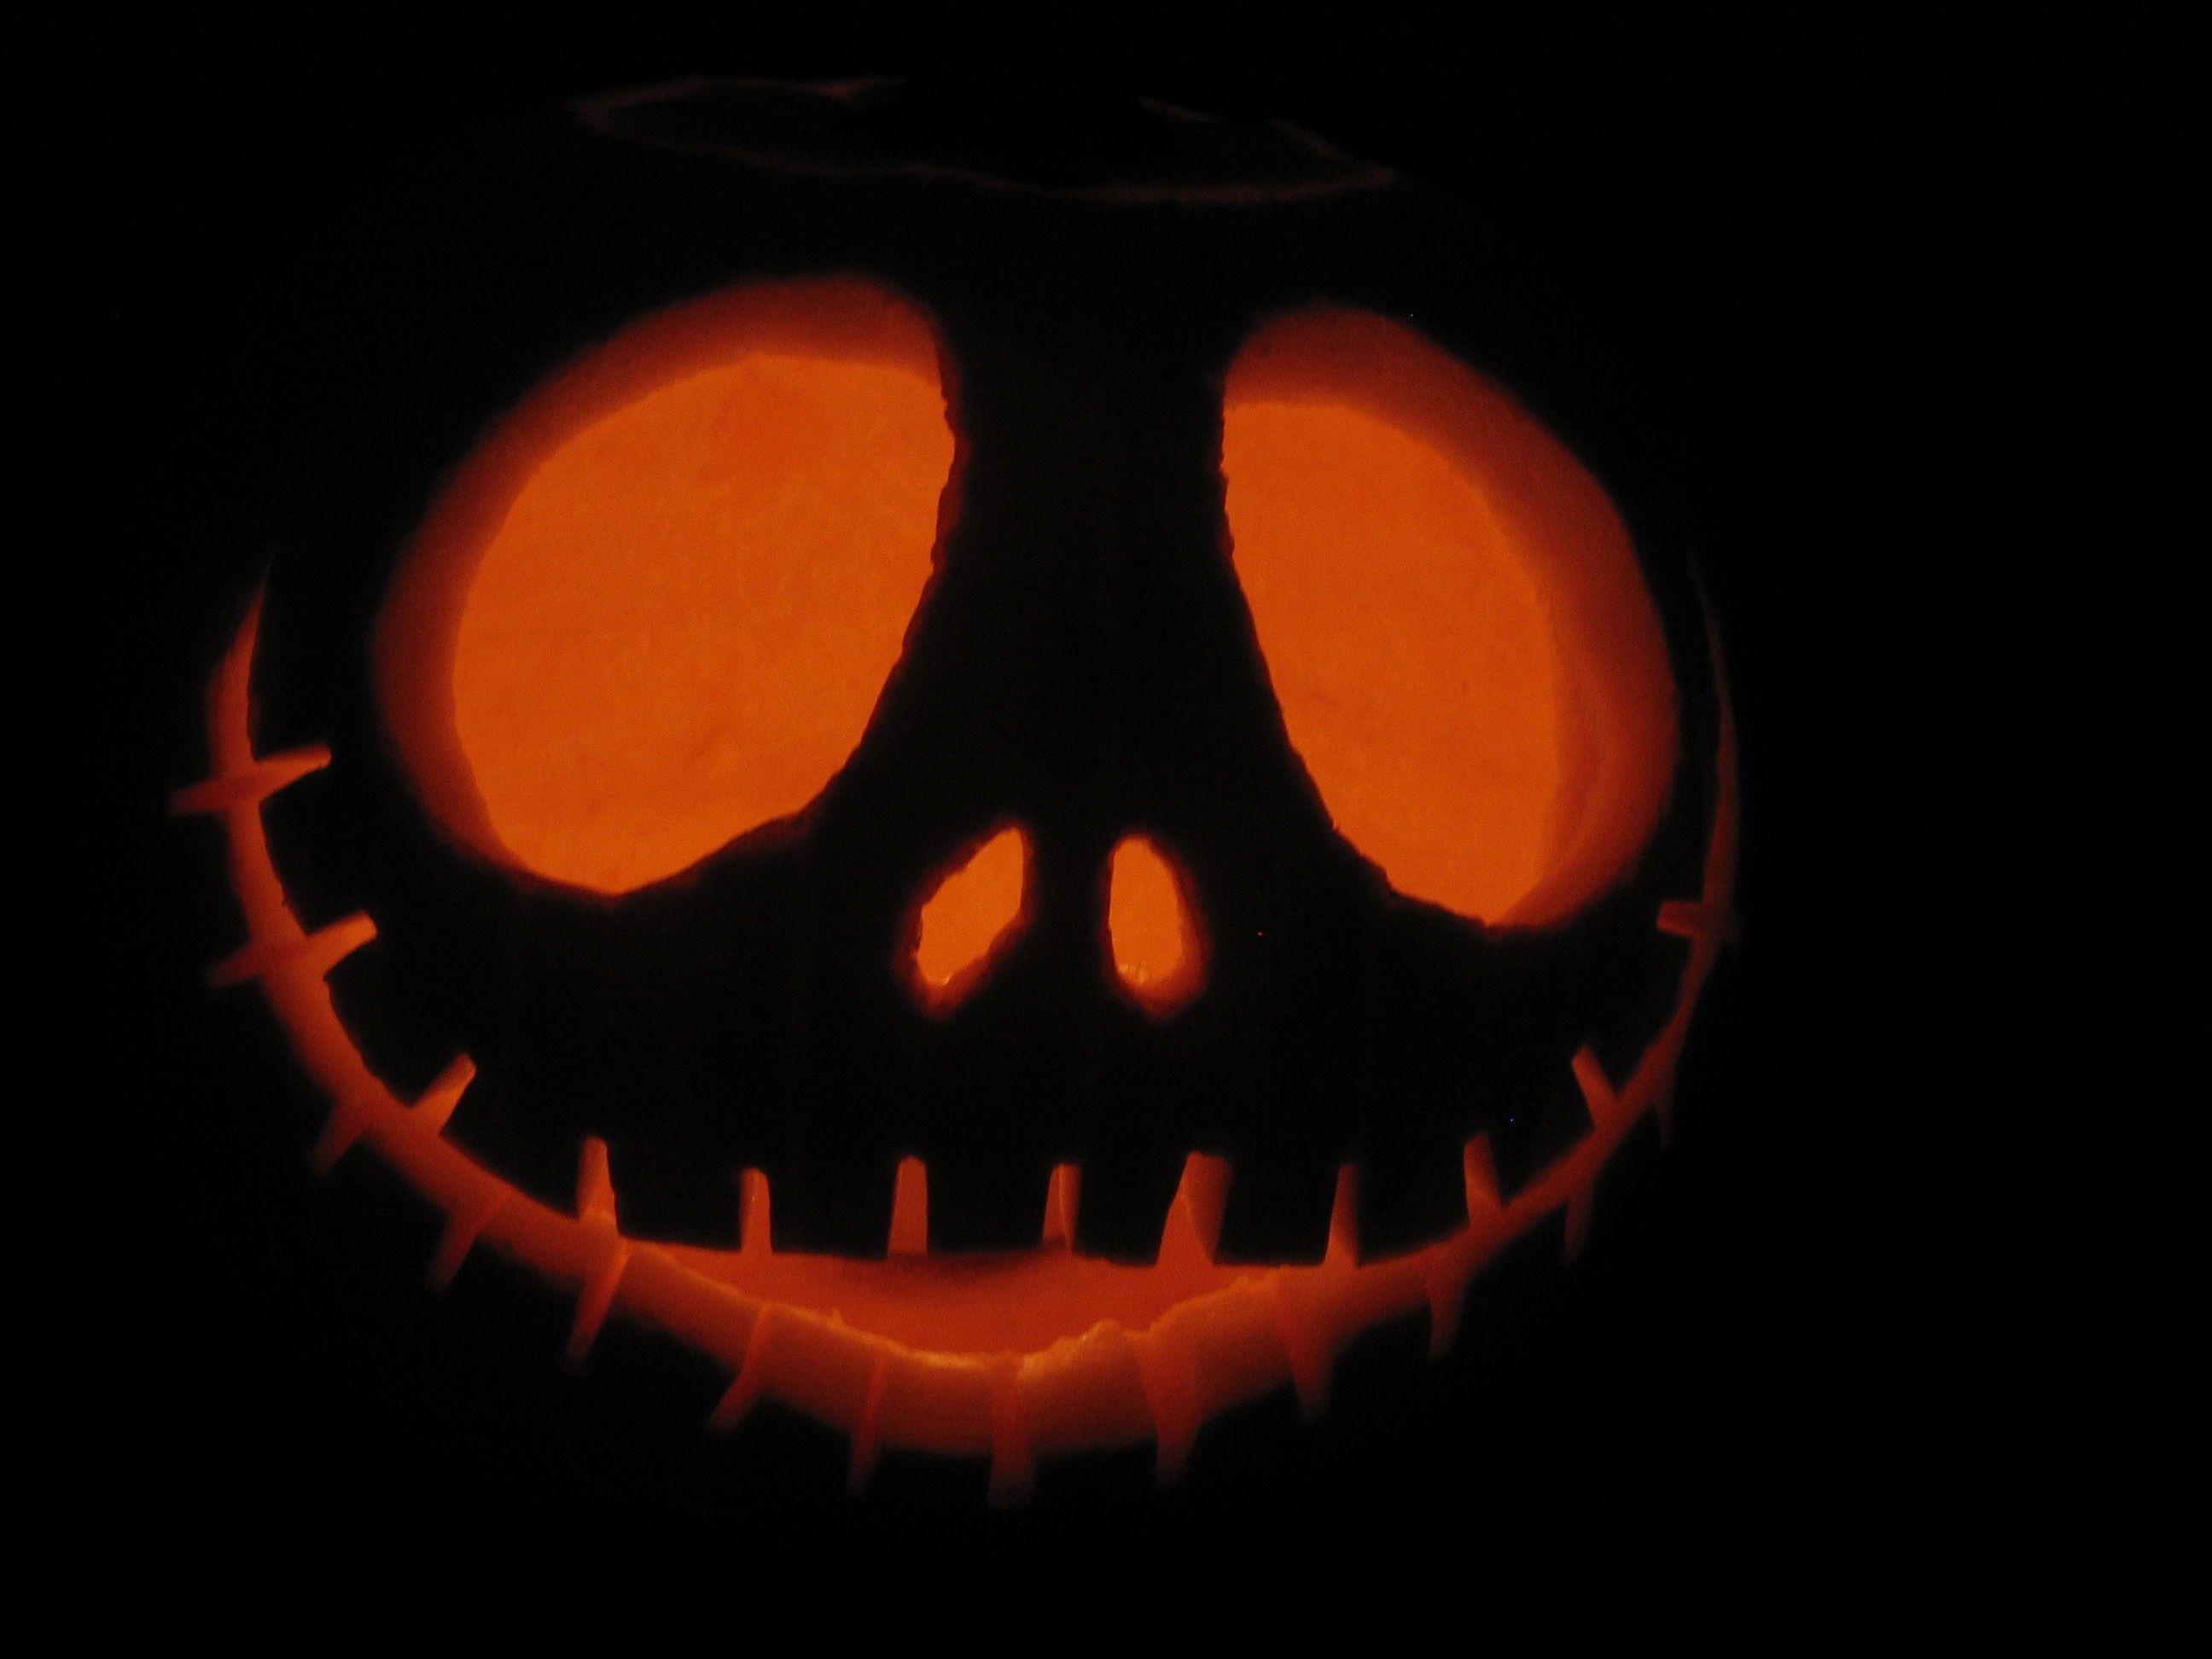 jack o'lantern face ideas - Google Search | Jack-o-lanterns and ...